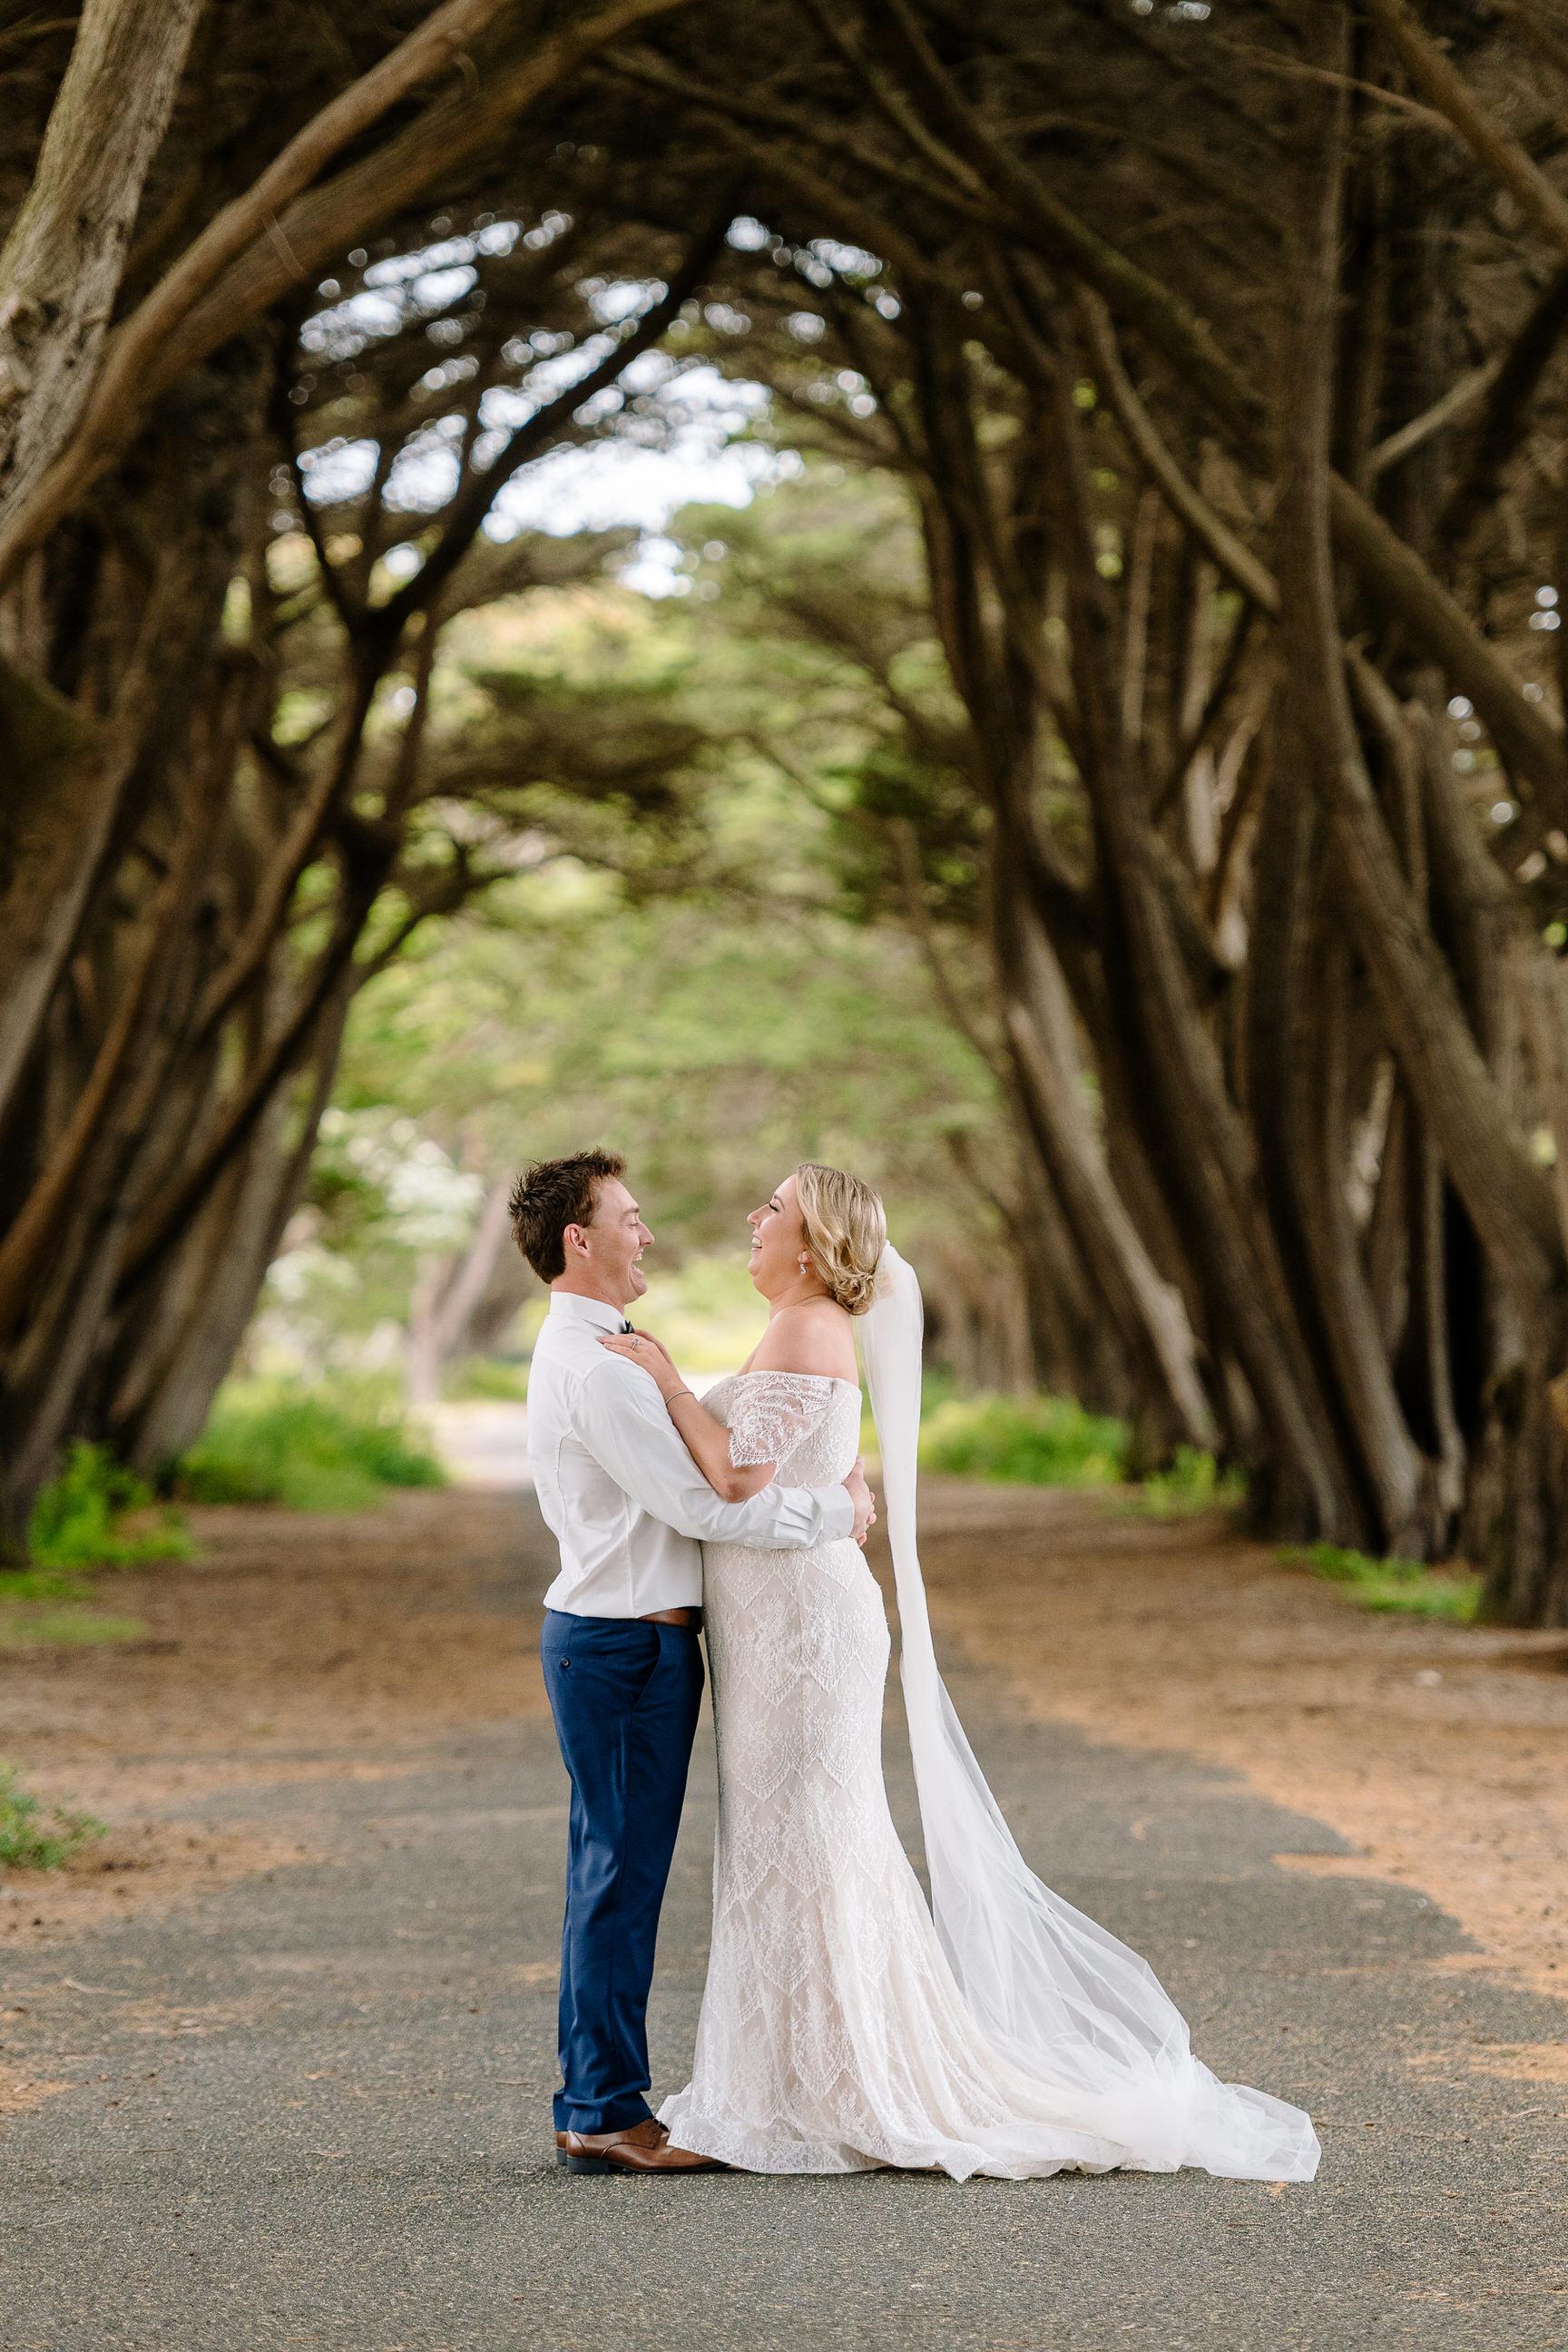 Justin_And_Jim_Photography_Portsea_Pub_Wedding52.JPG